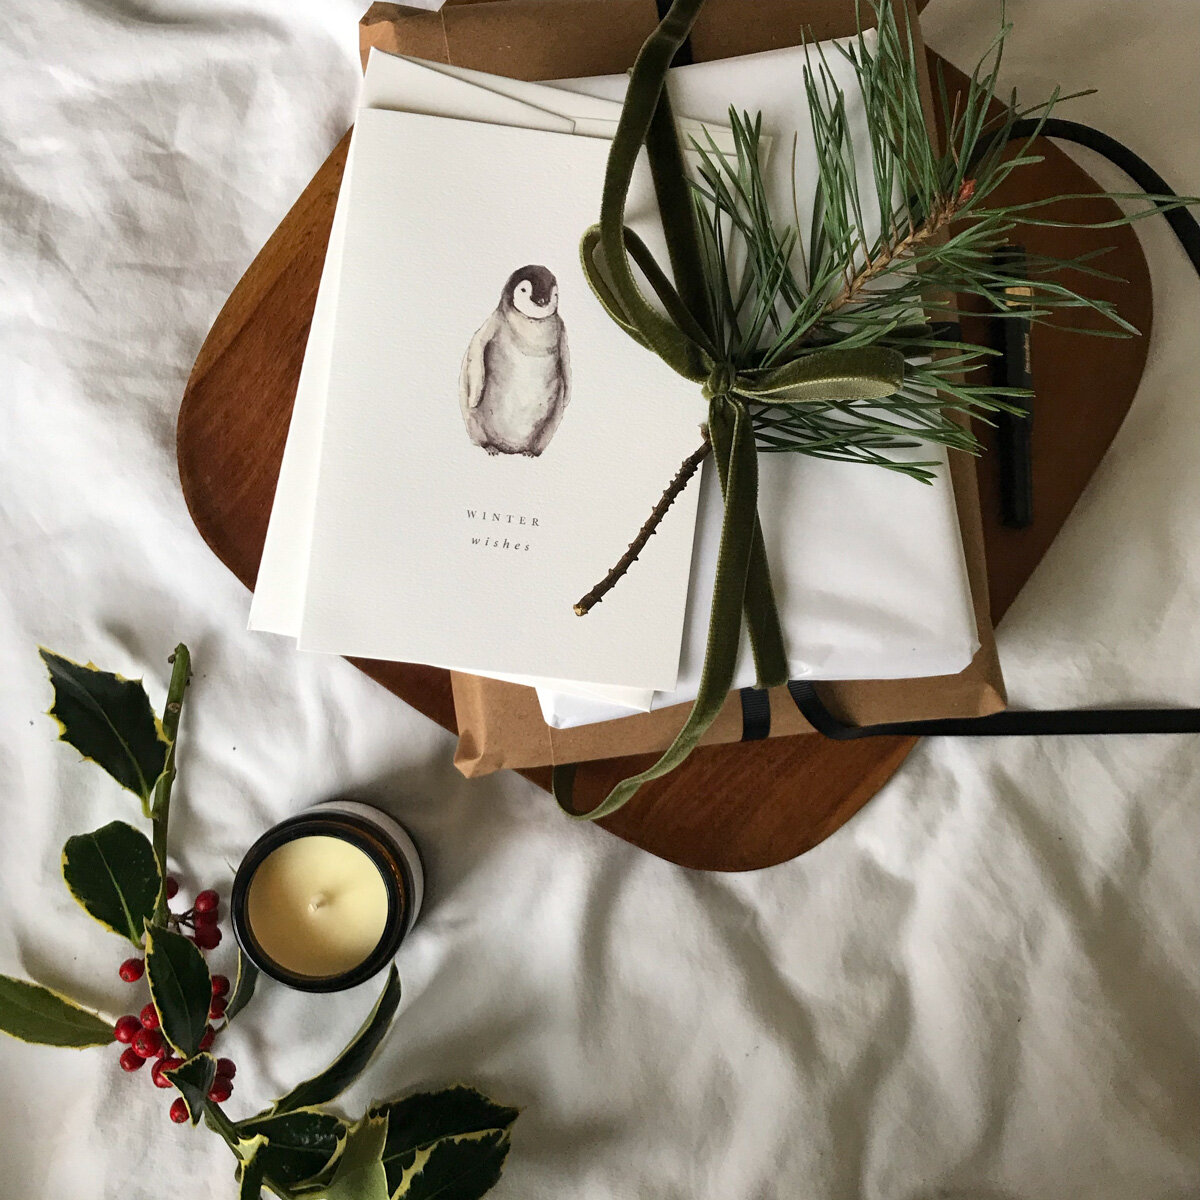 Small Shop Christmas Gift Guide